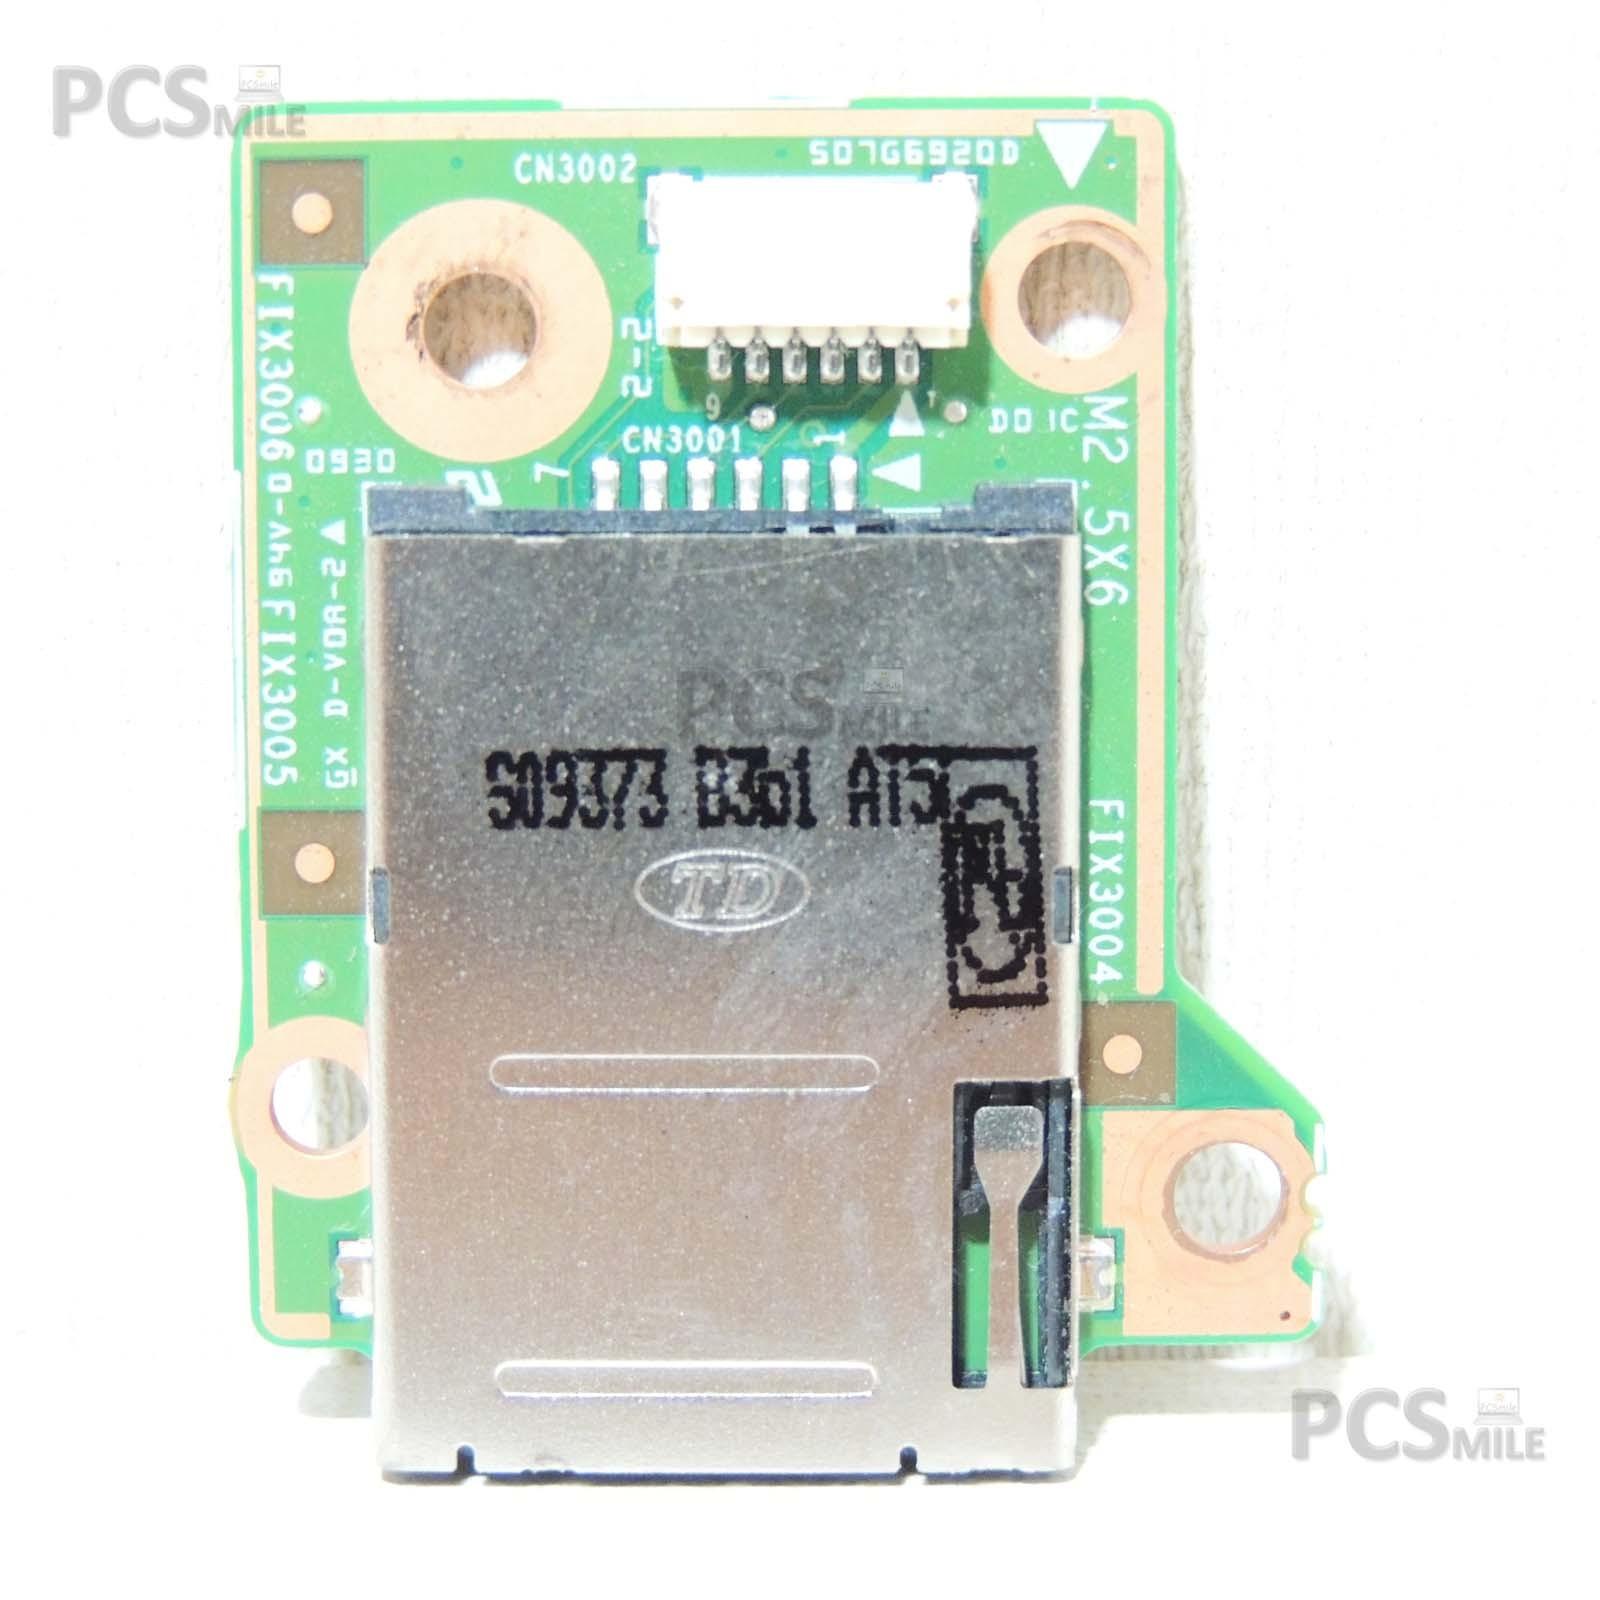 Fujitsu Esprimo Mobile V6555 Z17M 6050a2209401 a05 SIM BOARD Carrellino SIM